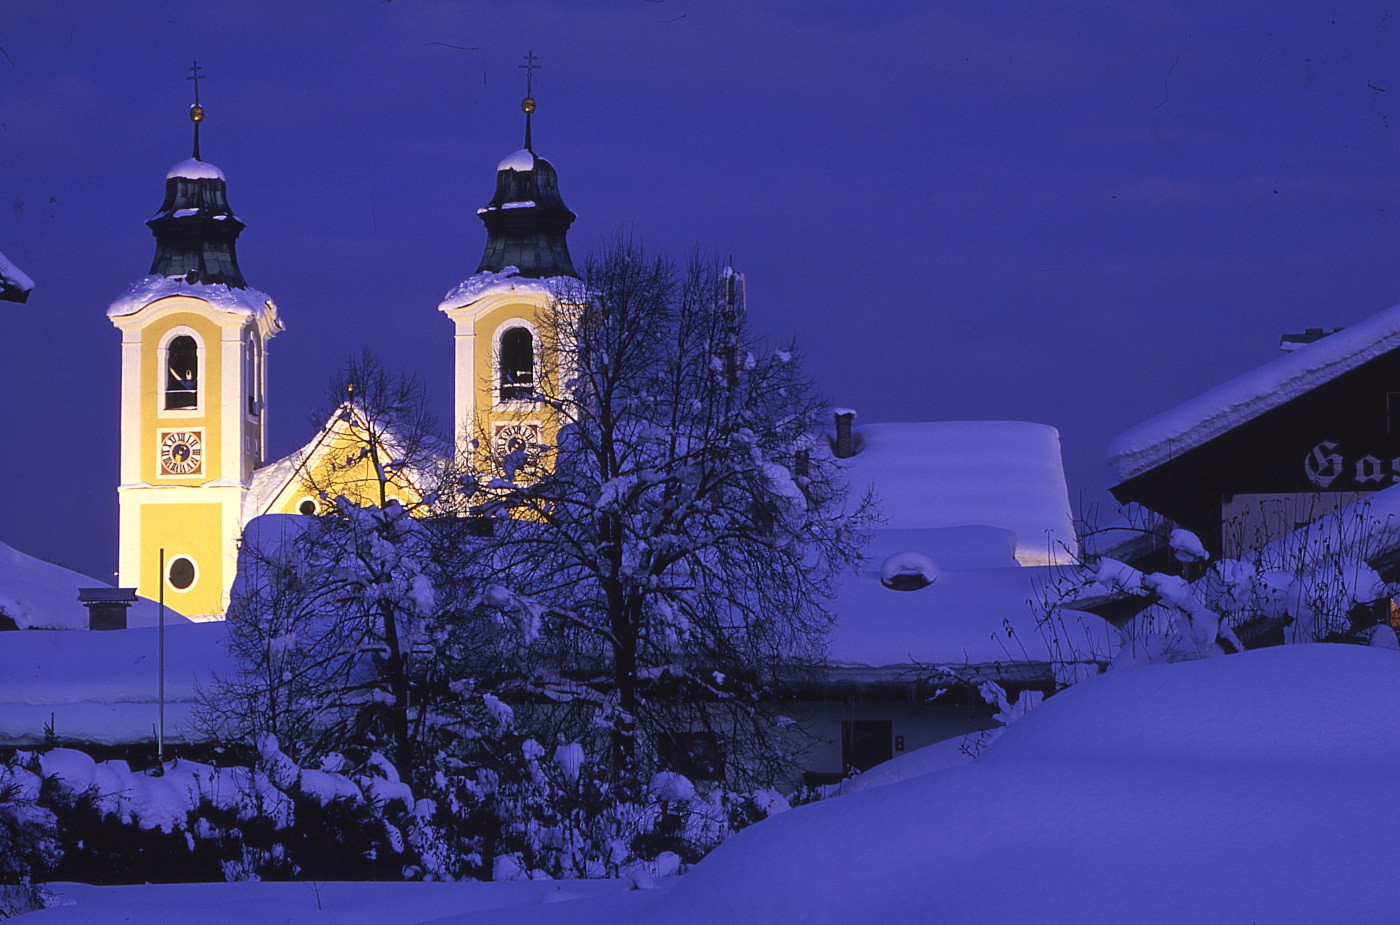 St Johann in Tirol, Austria